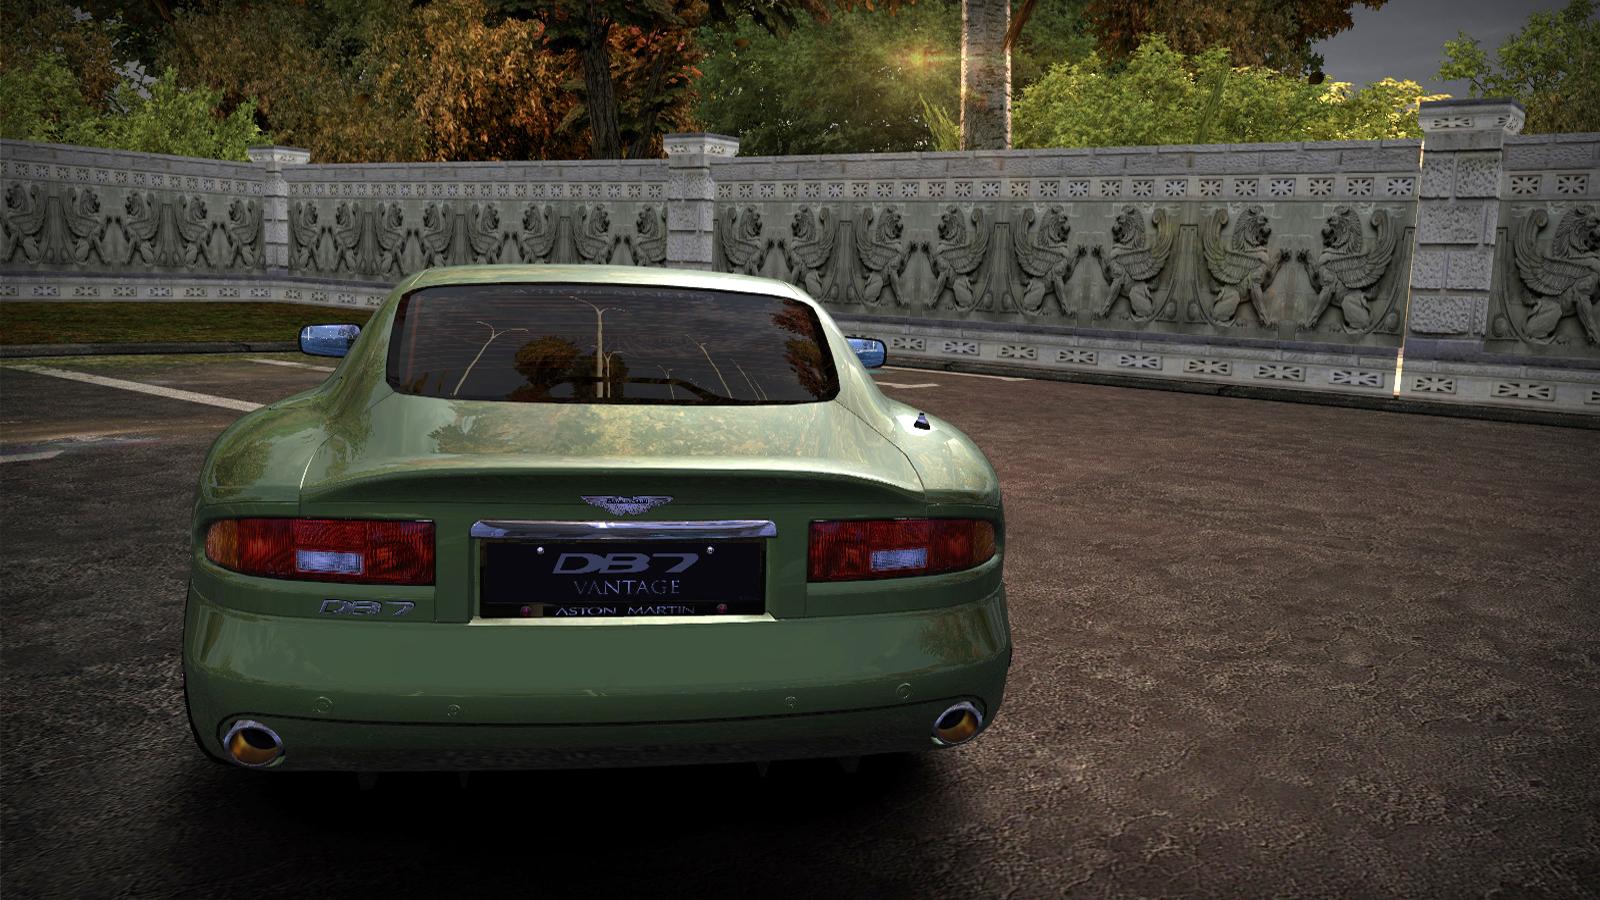 Speed 2020-01-05 19-14-54-406.jpg - Need for Speed: Most Wanted (2005) Aston Martin DB7 Vantage, Автомобиль